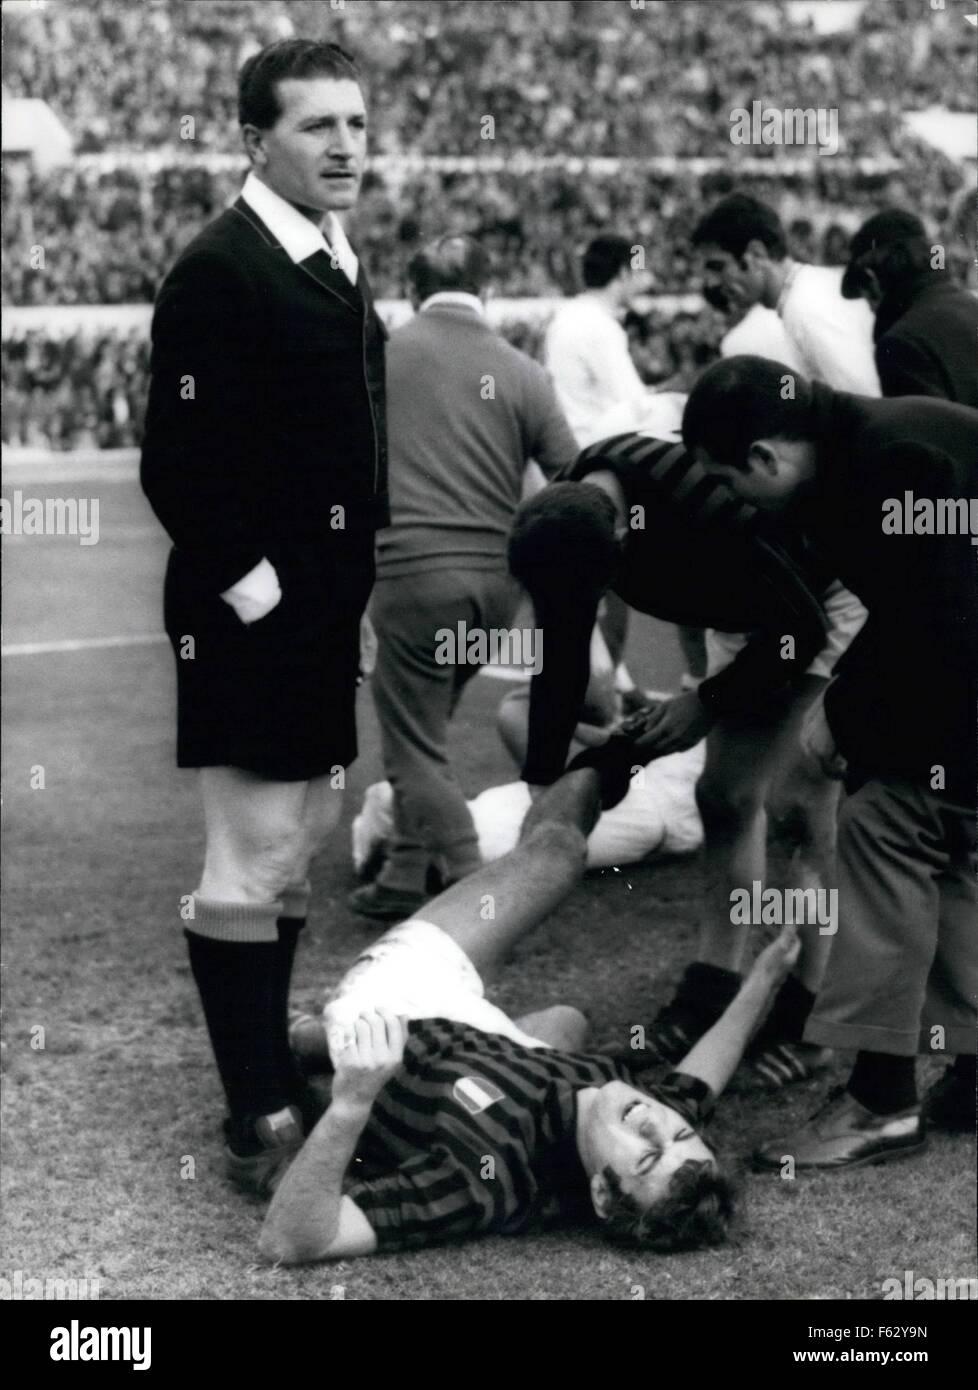 1968 Beruhmter Italienischer Fussballschiedsrichter Concello Lo